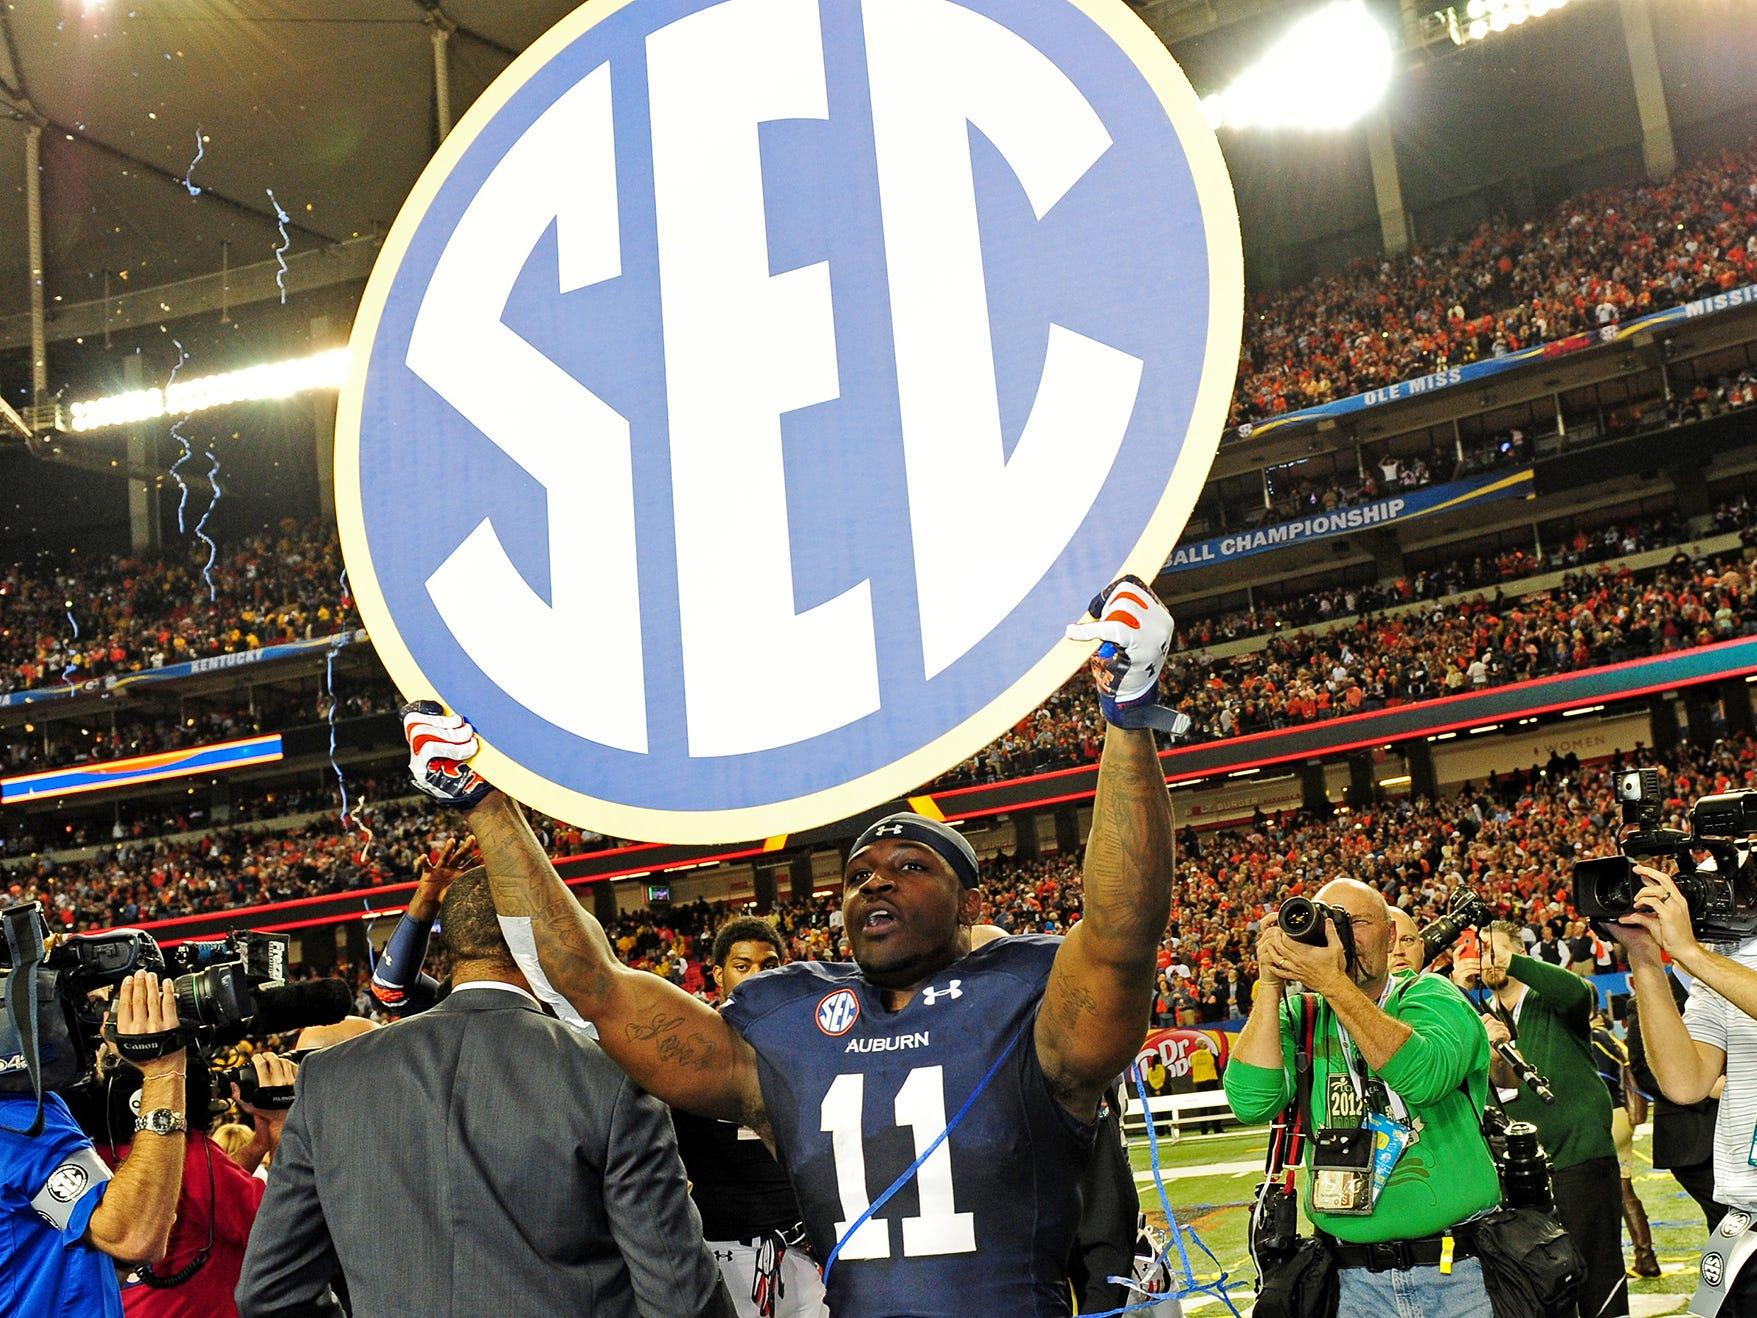 Auburn cornerback Chris Davis holds up the SEC sign after the 2013 SEC Championship game against Missouri.